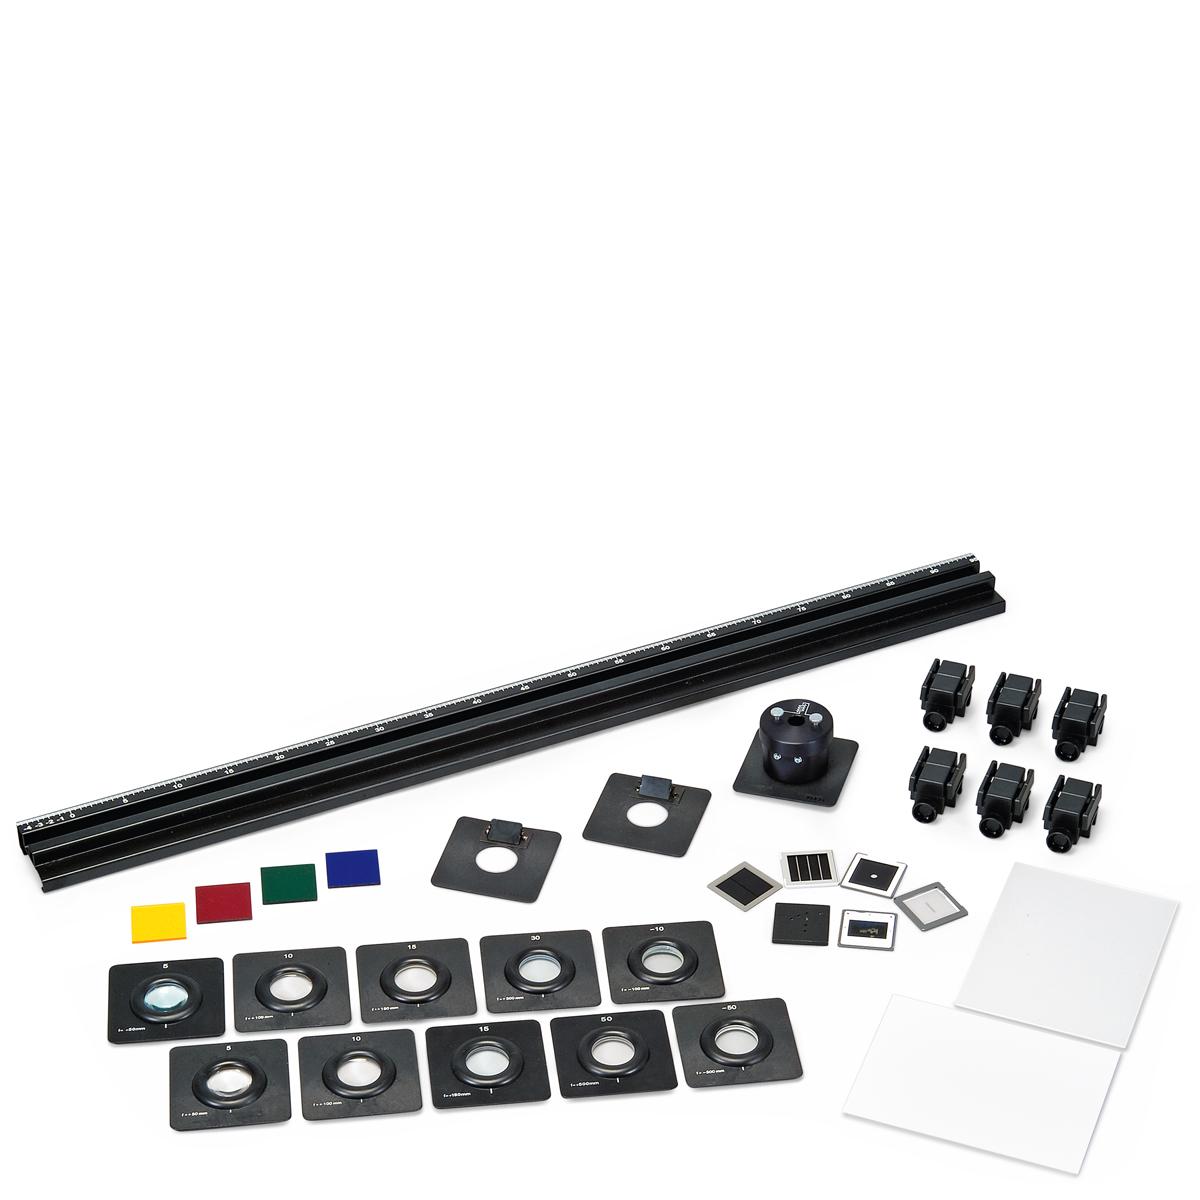 Experiment Kits For Physics Kröncke Optics Experiment Kit